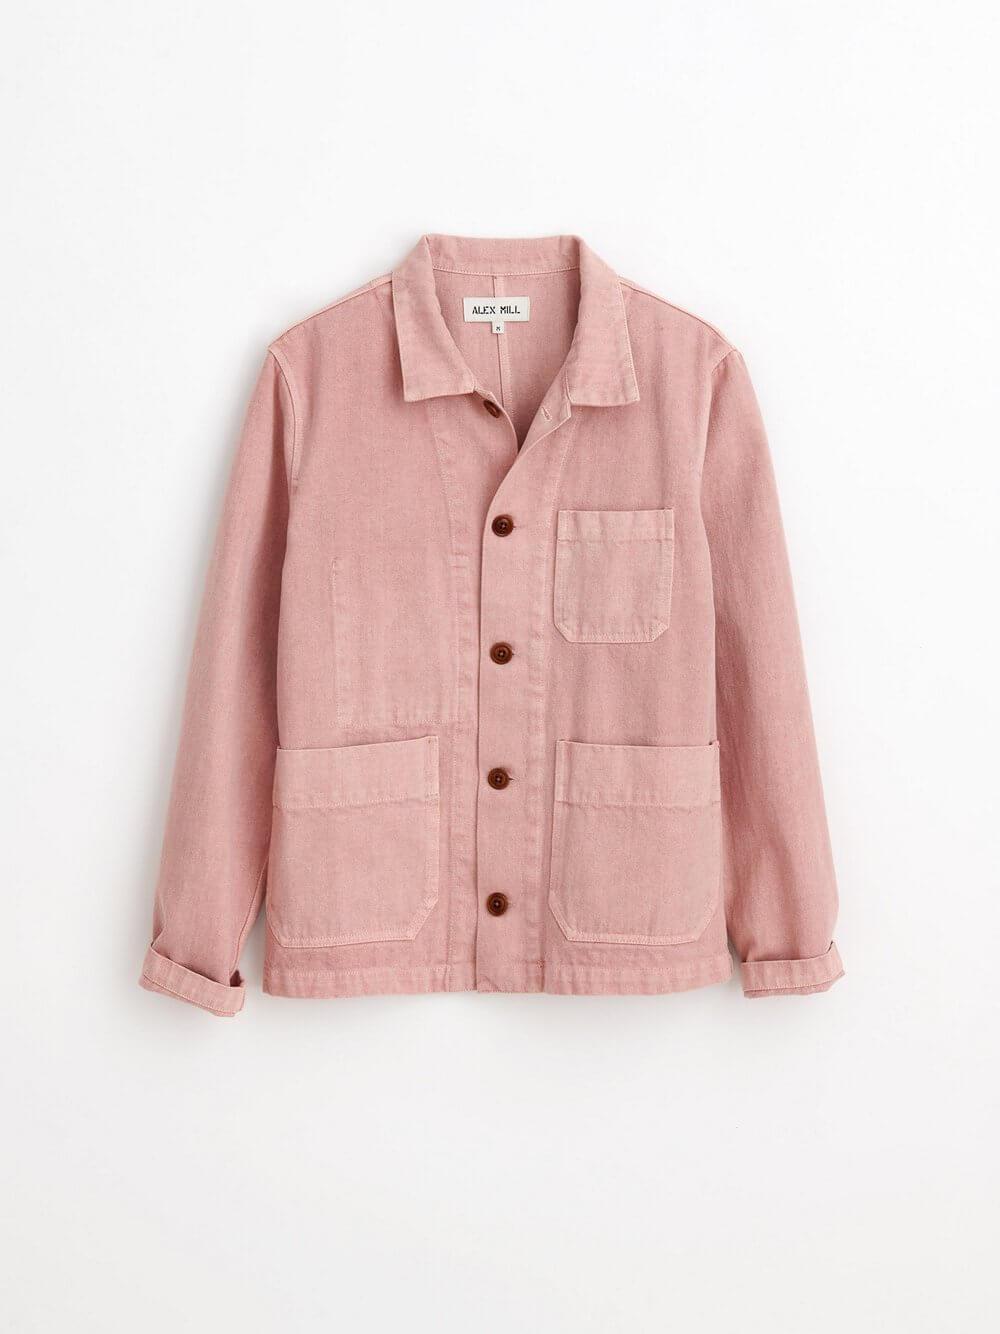 Britt Work Jacket In Recycled Denim Item # 206-WJ014-2551